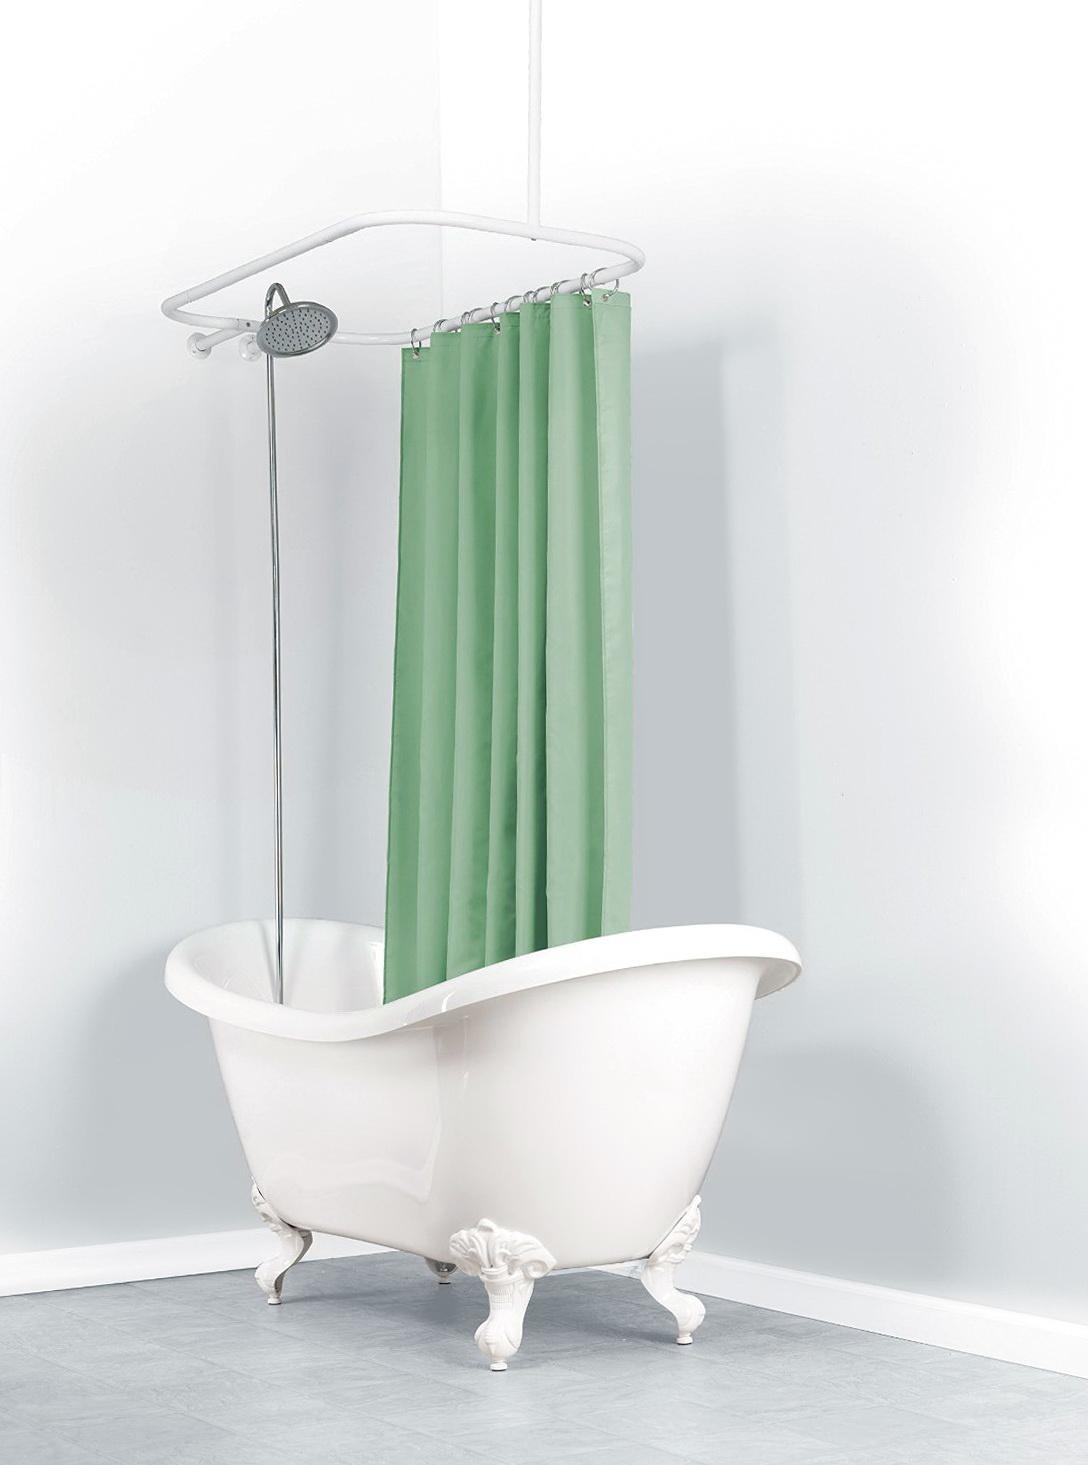 Shower Curtain Rod For Clawfoot Tub Canada Home Design Ideas